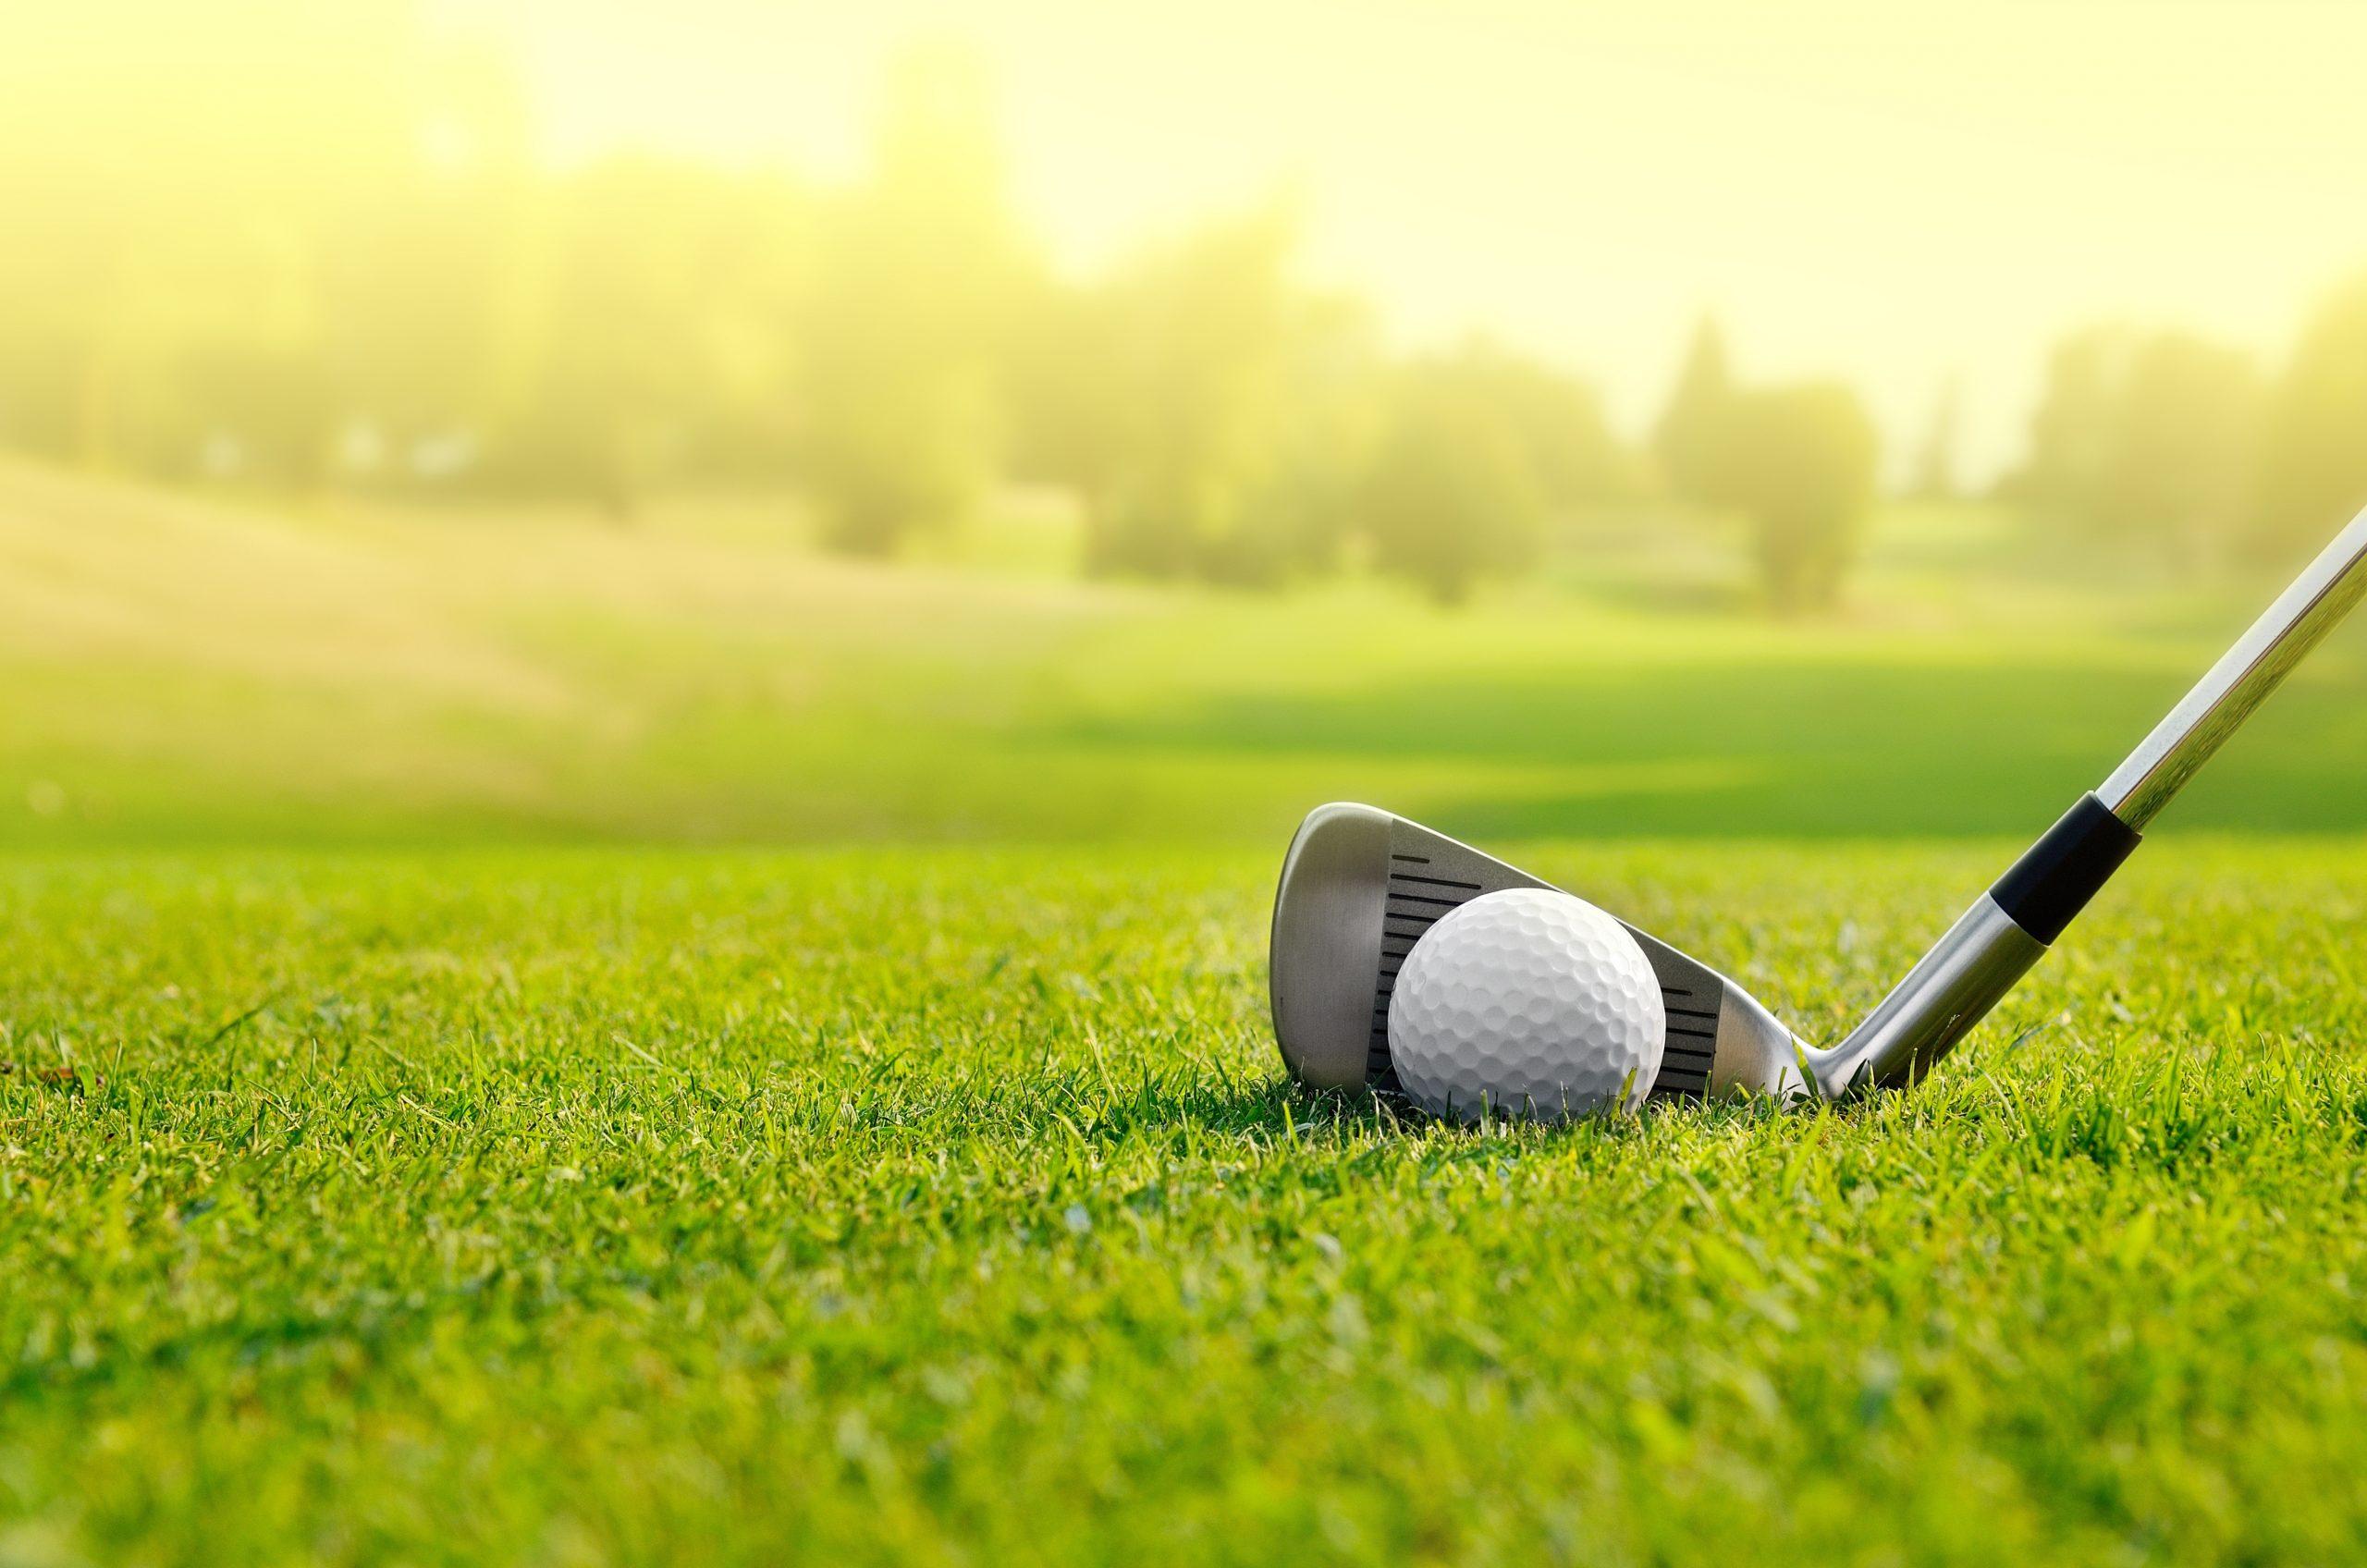 Šport Golf